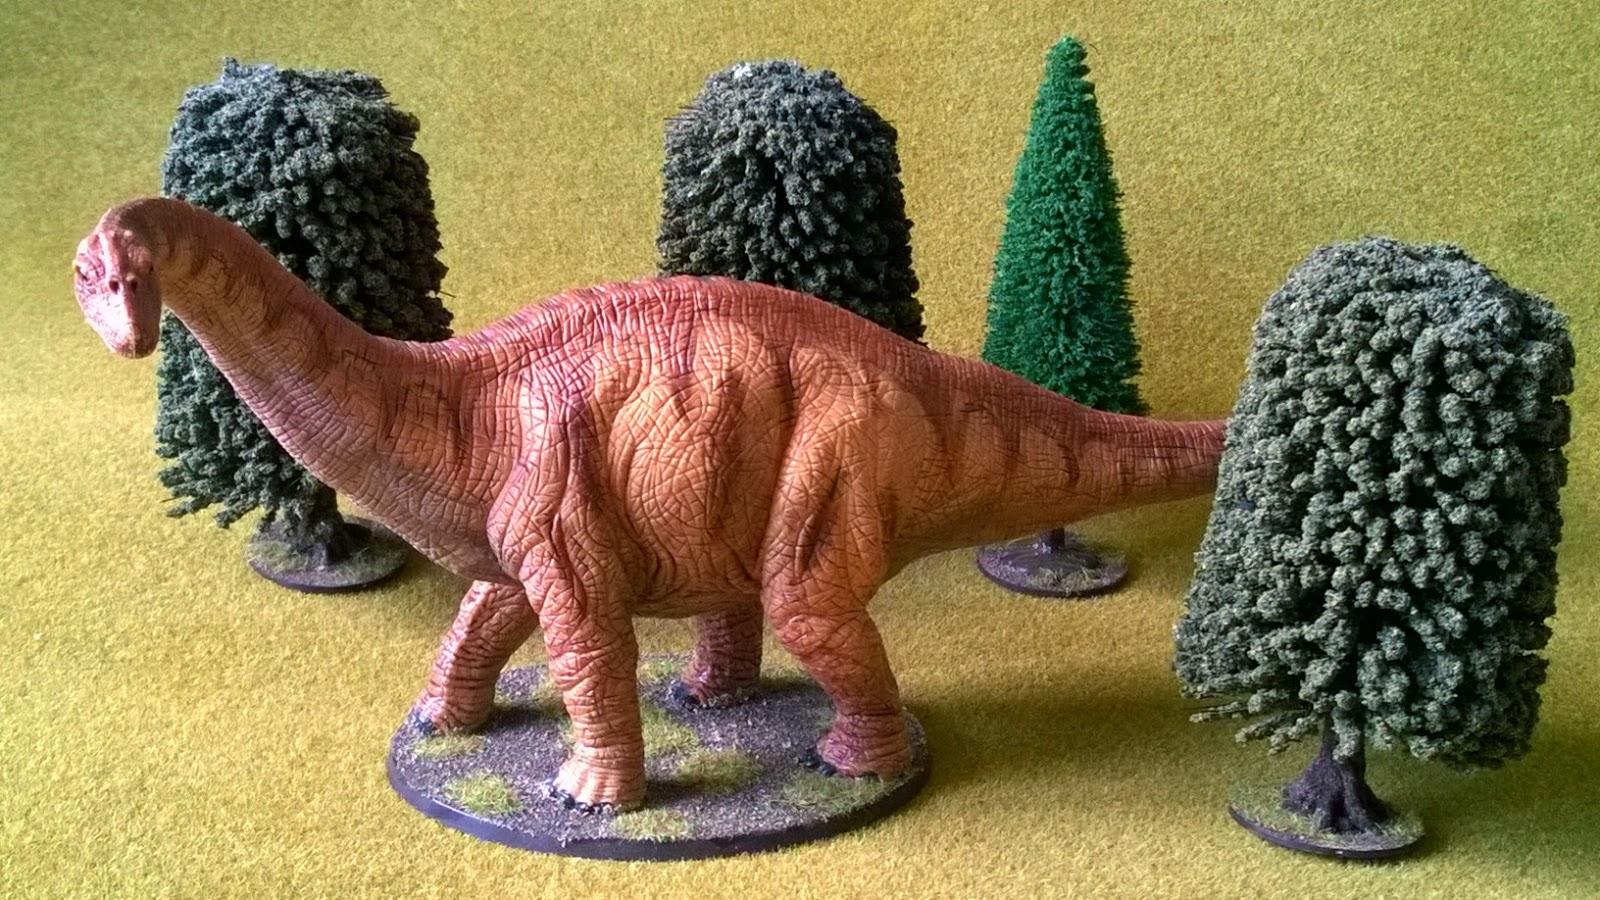 Apatosaurus Schleich dinosaur hunting 28mm dino